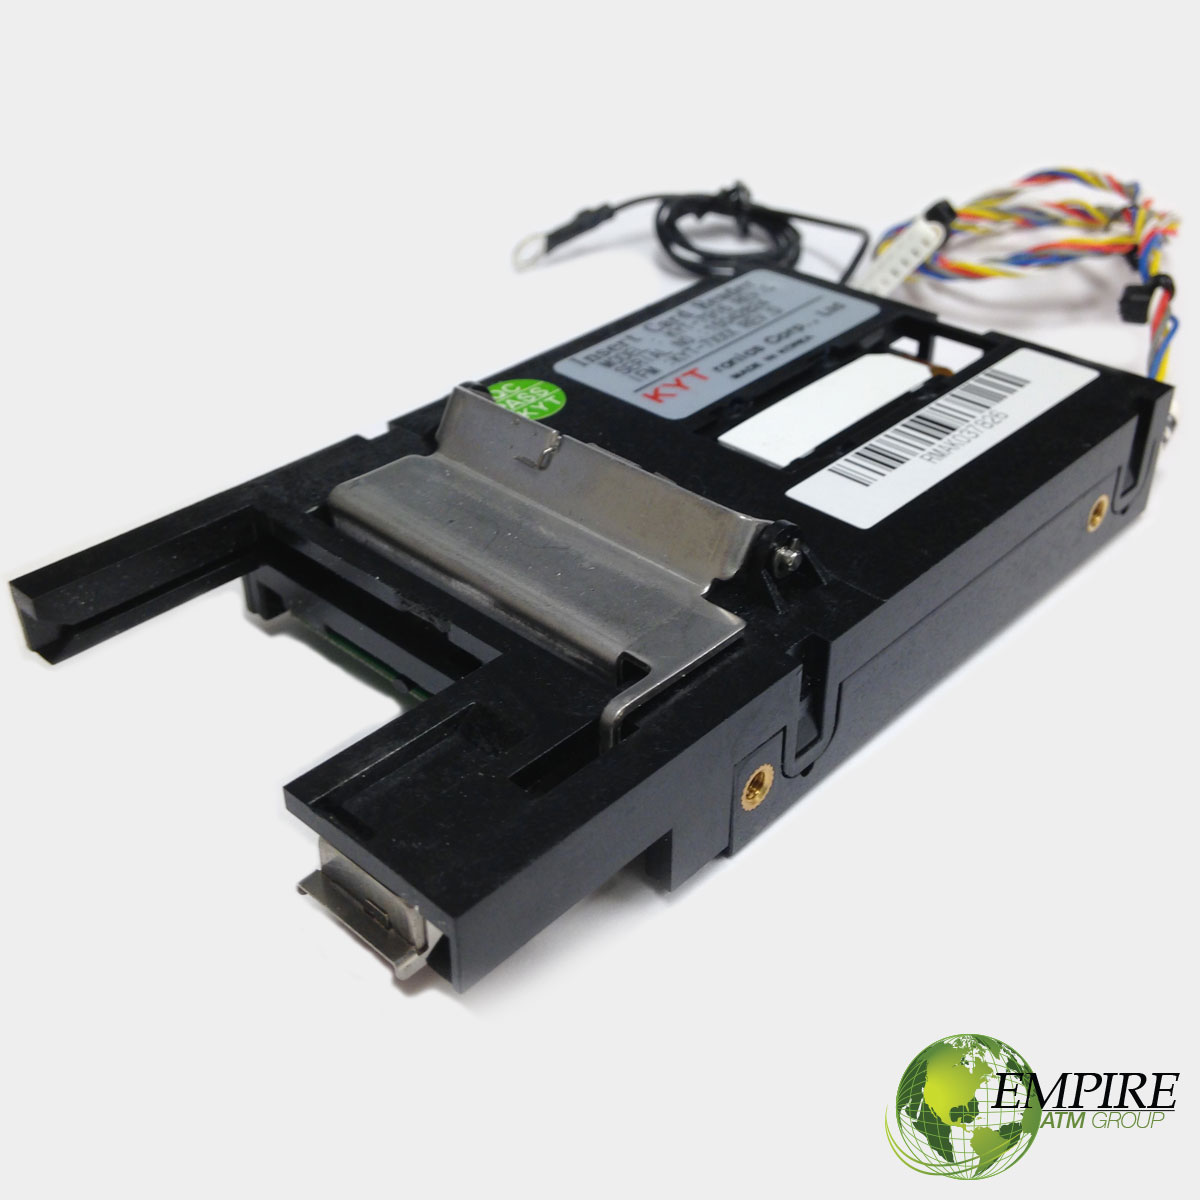 Nautilus Hyosung EMV Kits